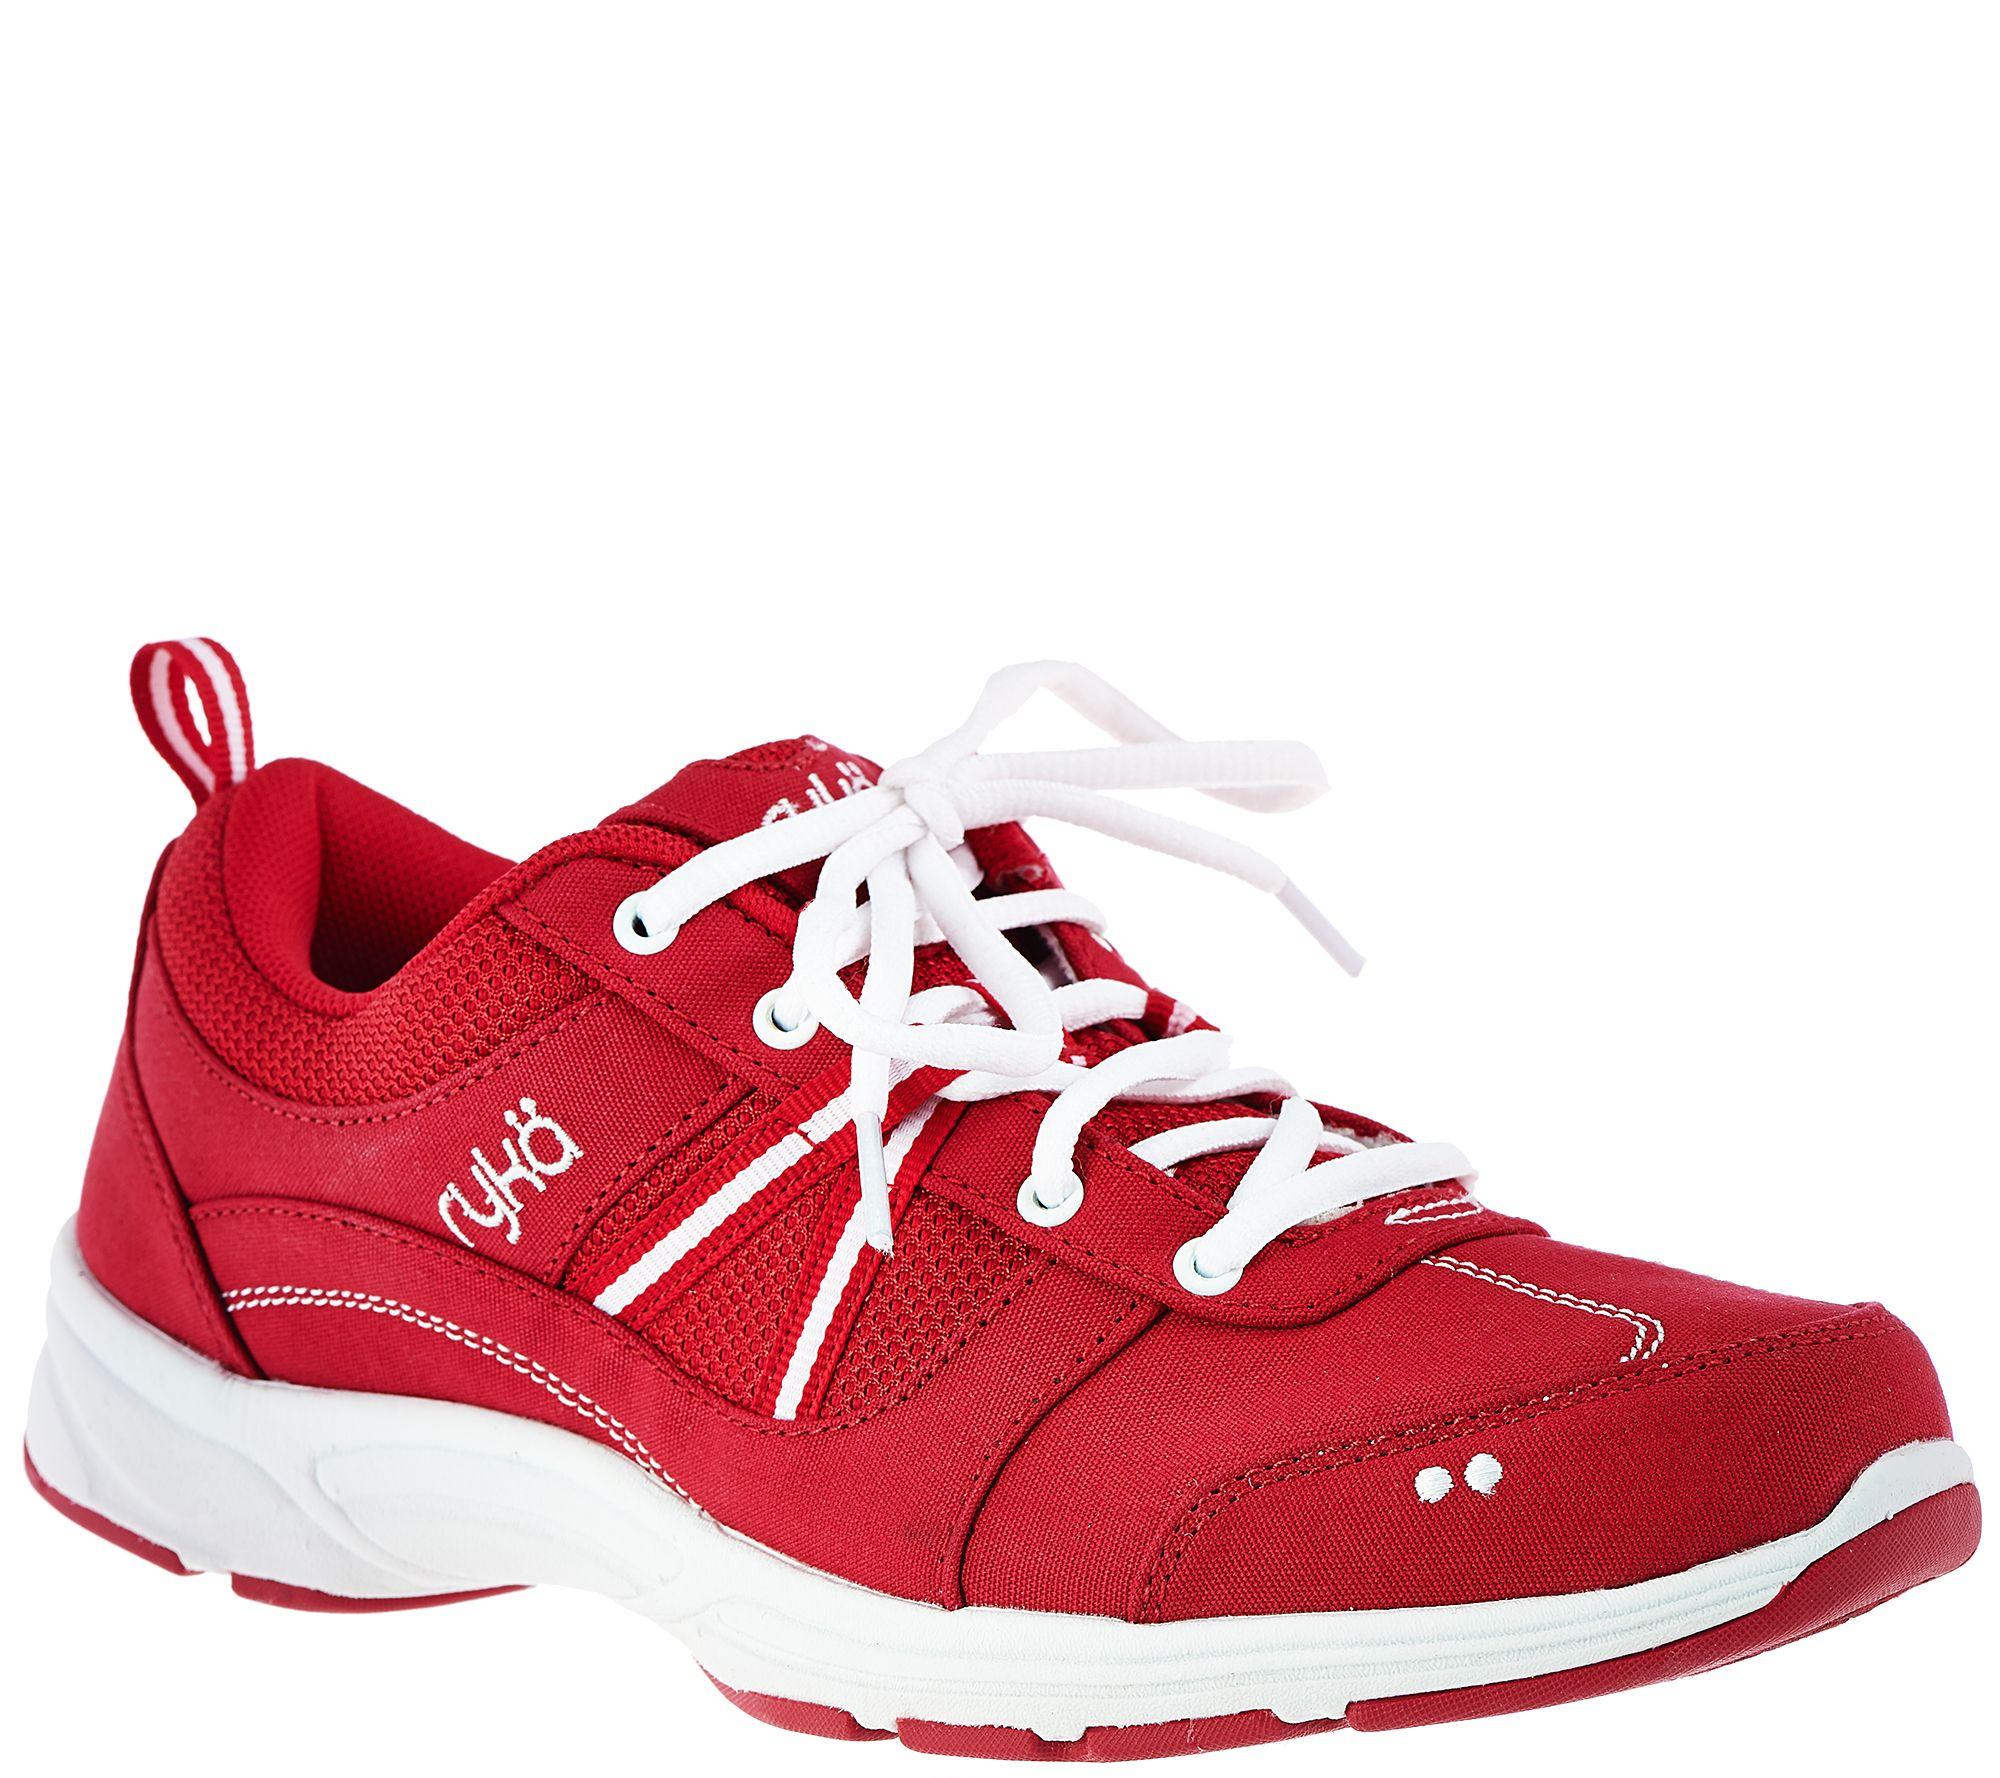 Avia Ginger Walking Shoes Wide